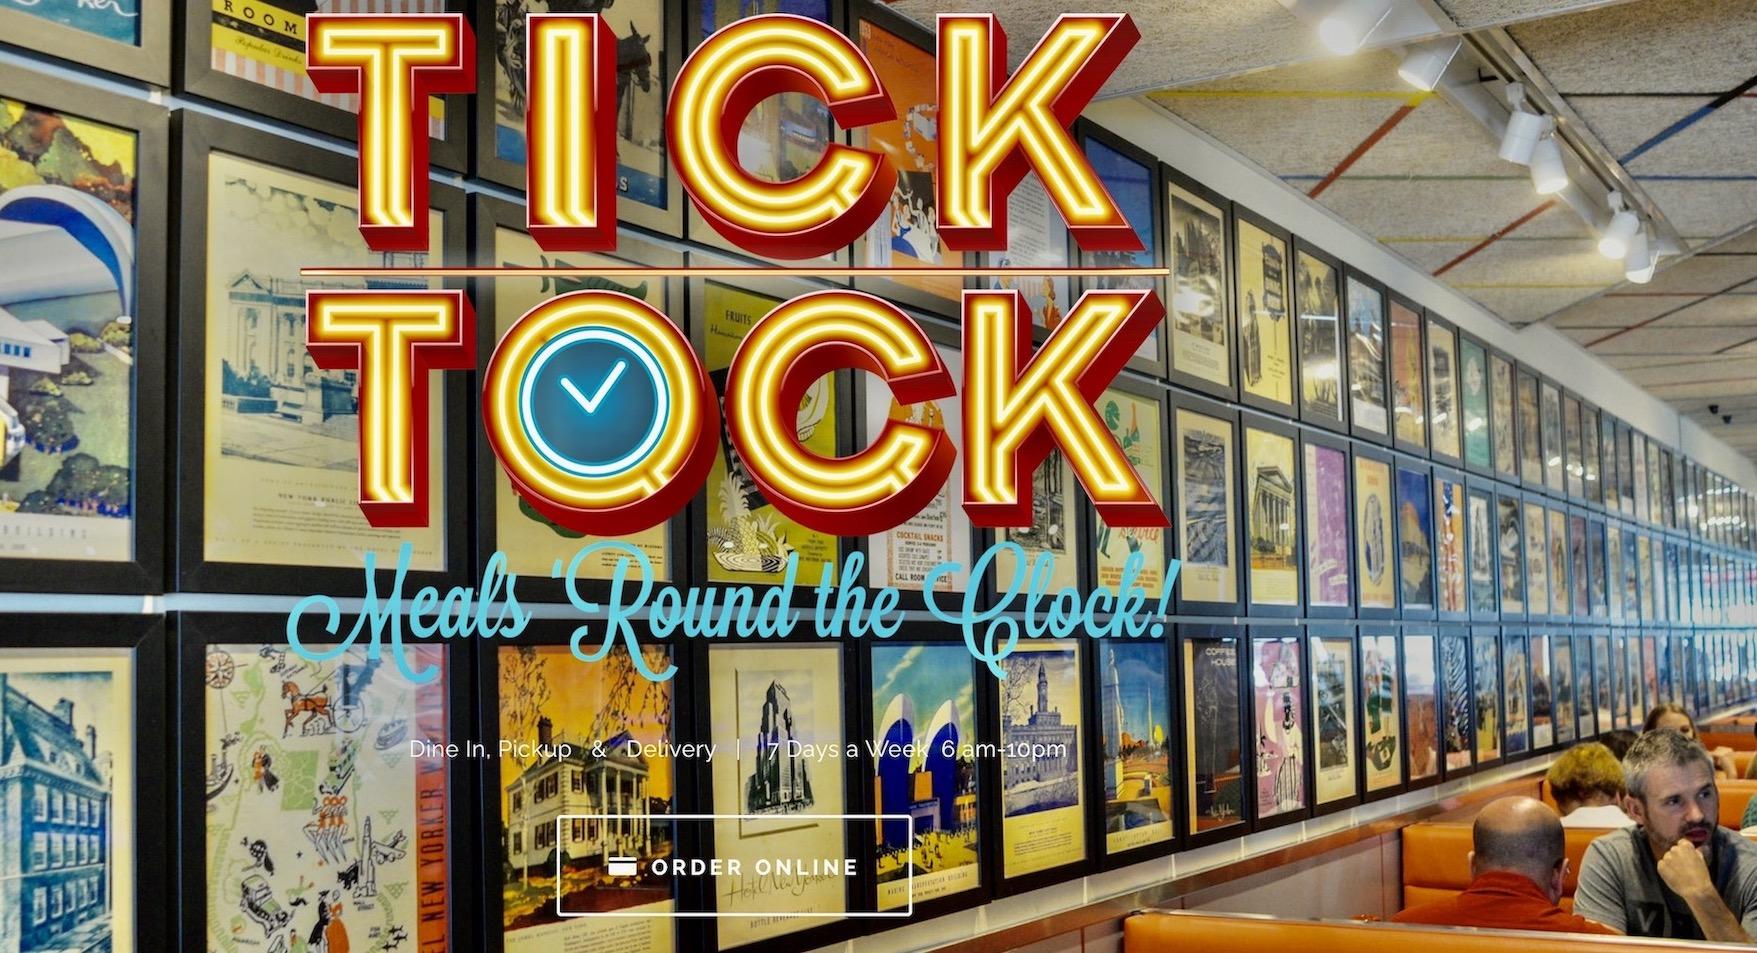 The Tick Tock diner New York City Nostalgia